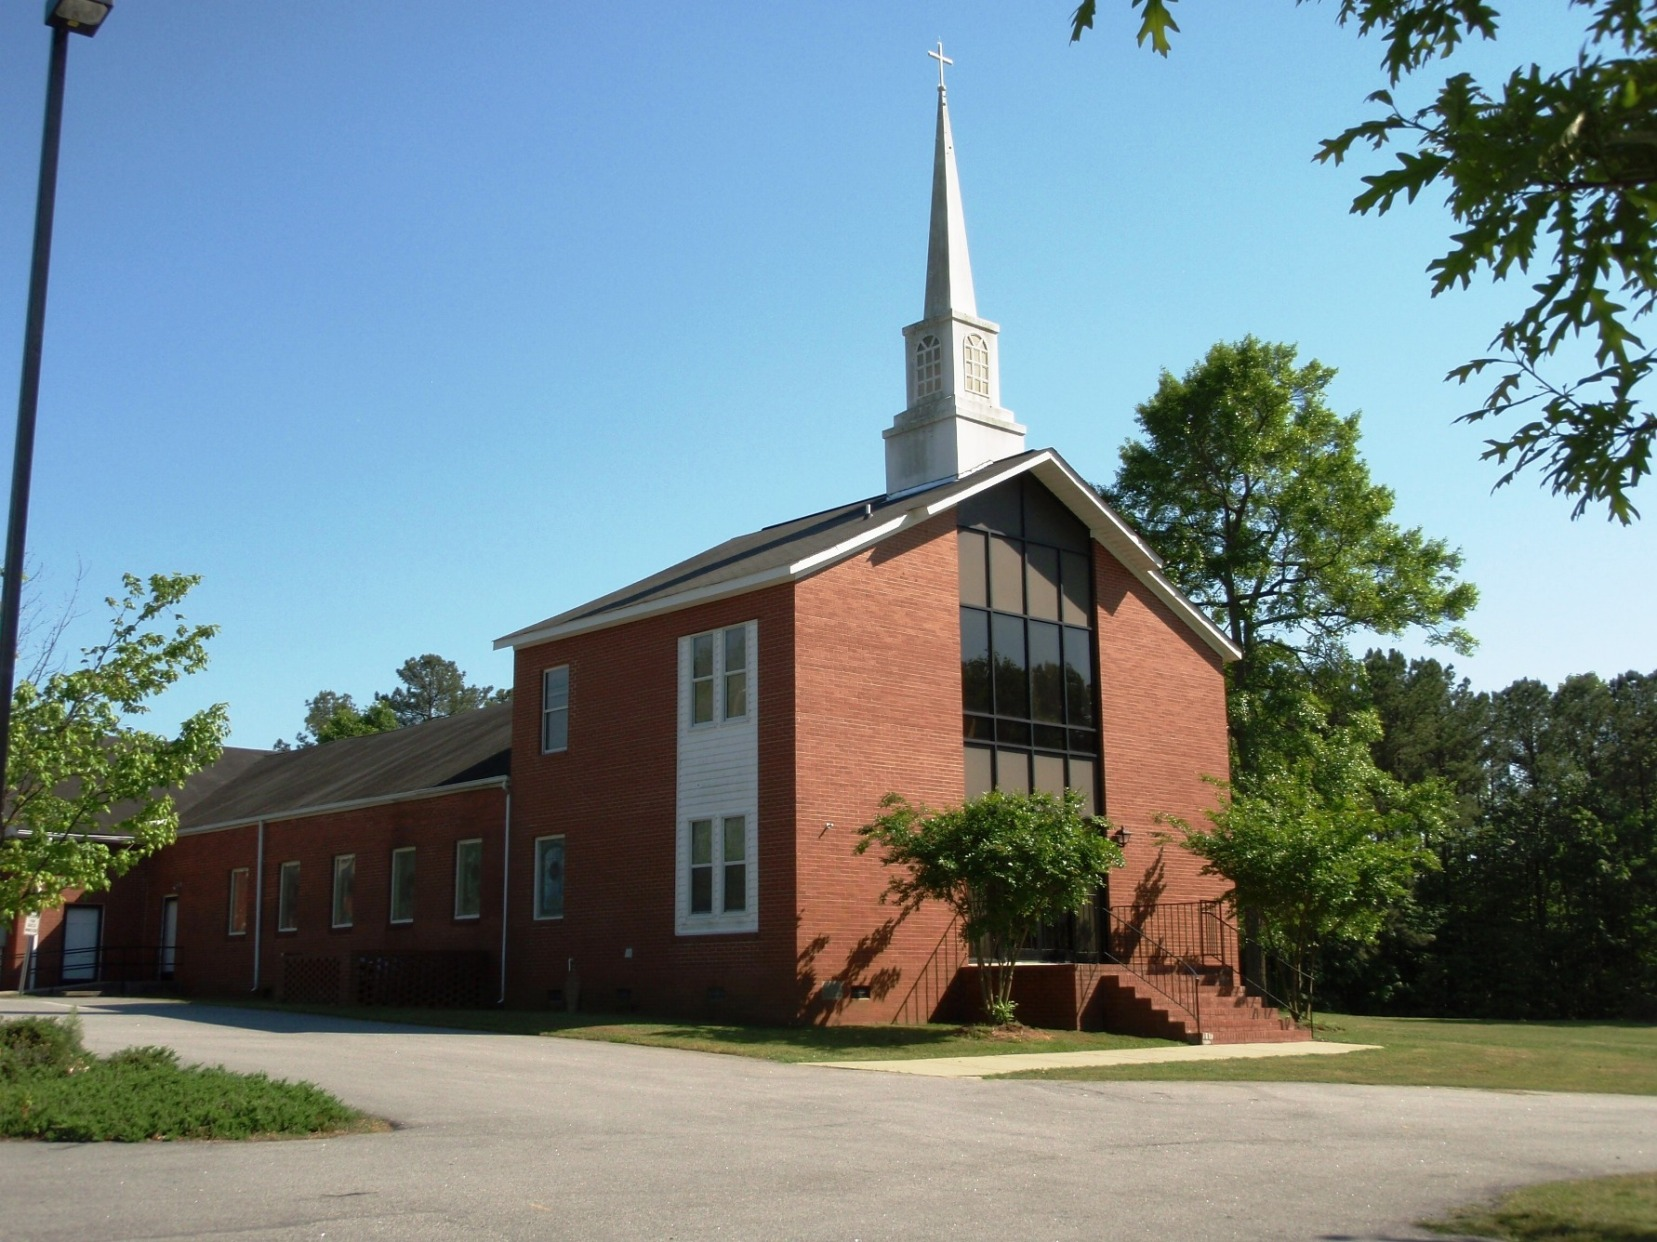 Saint Mary Freewill Baptist Church Cemetery